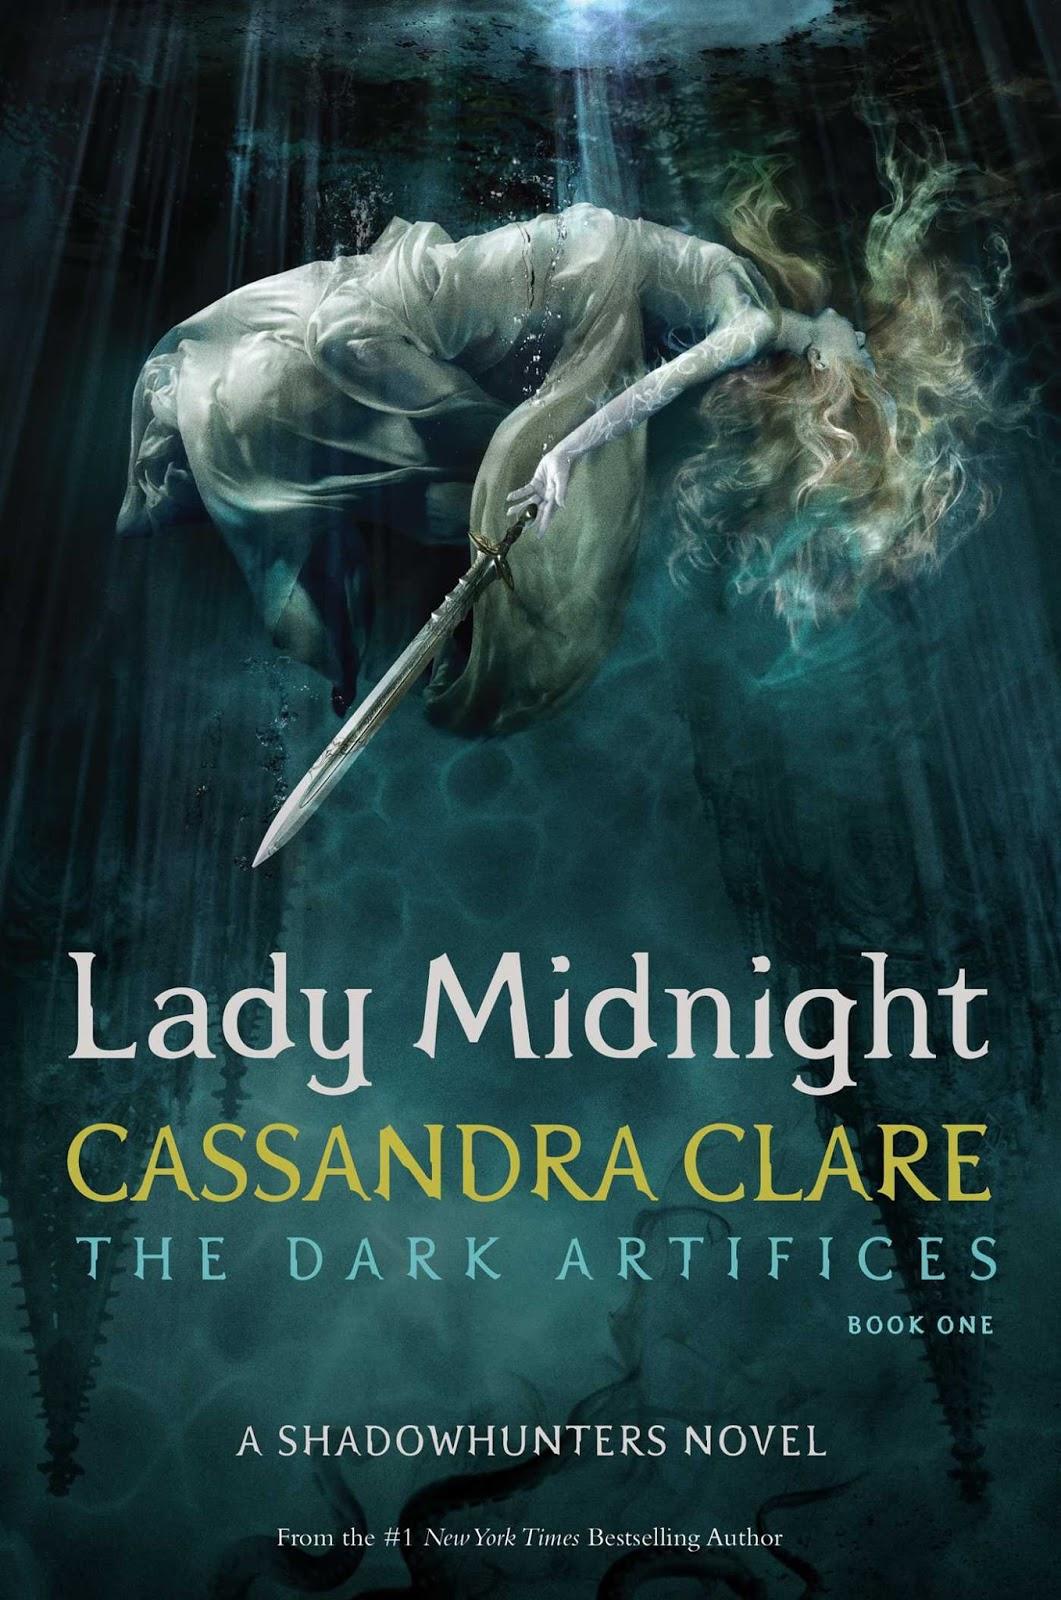 Lady Midnight The Dark Artifices Cassandra Clare Shadowhunters